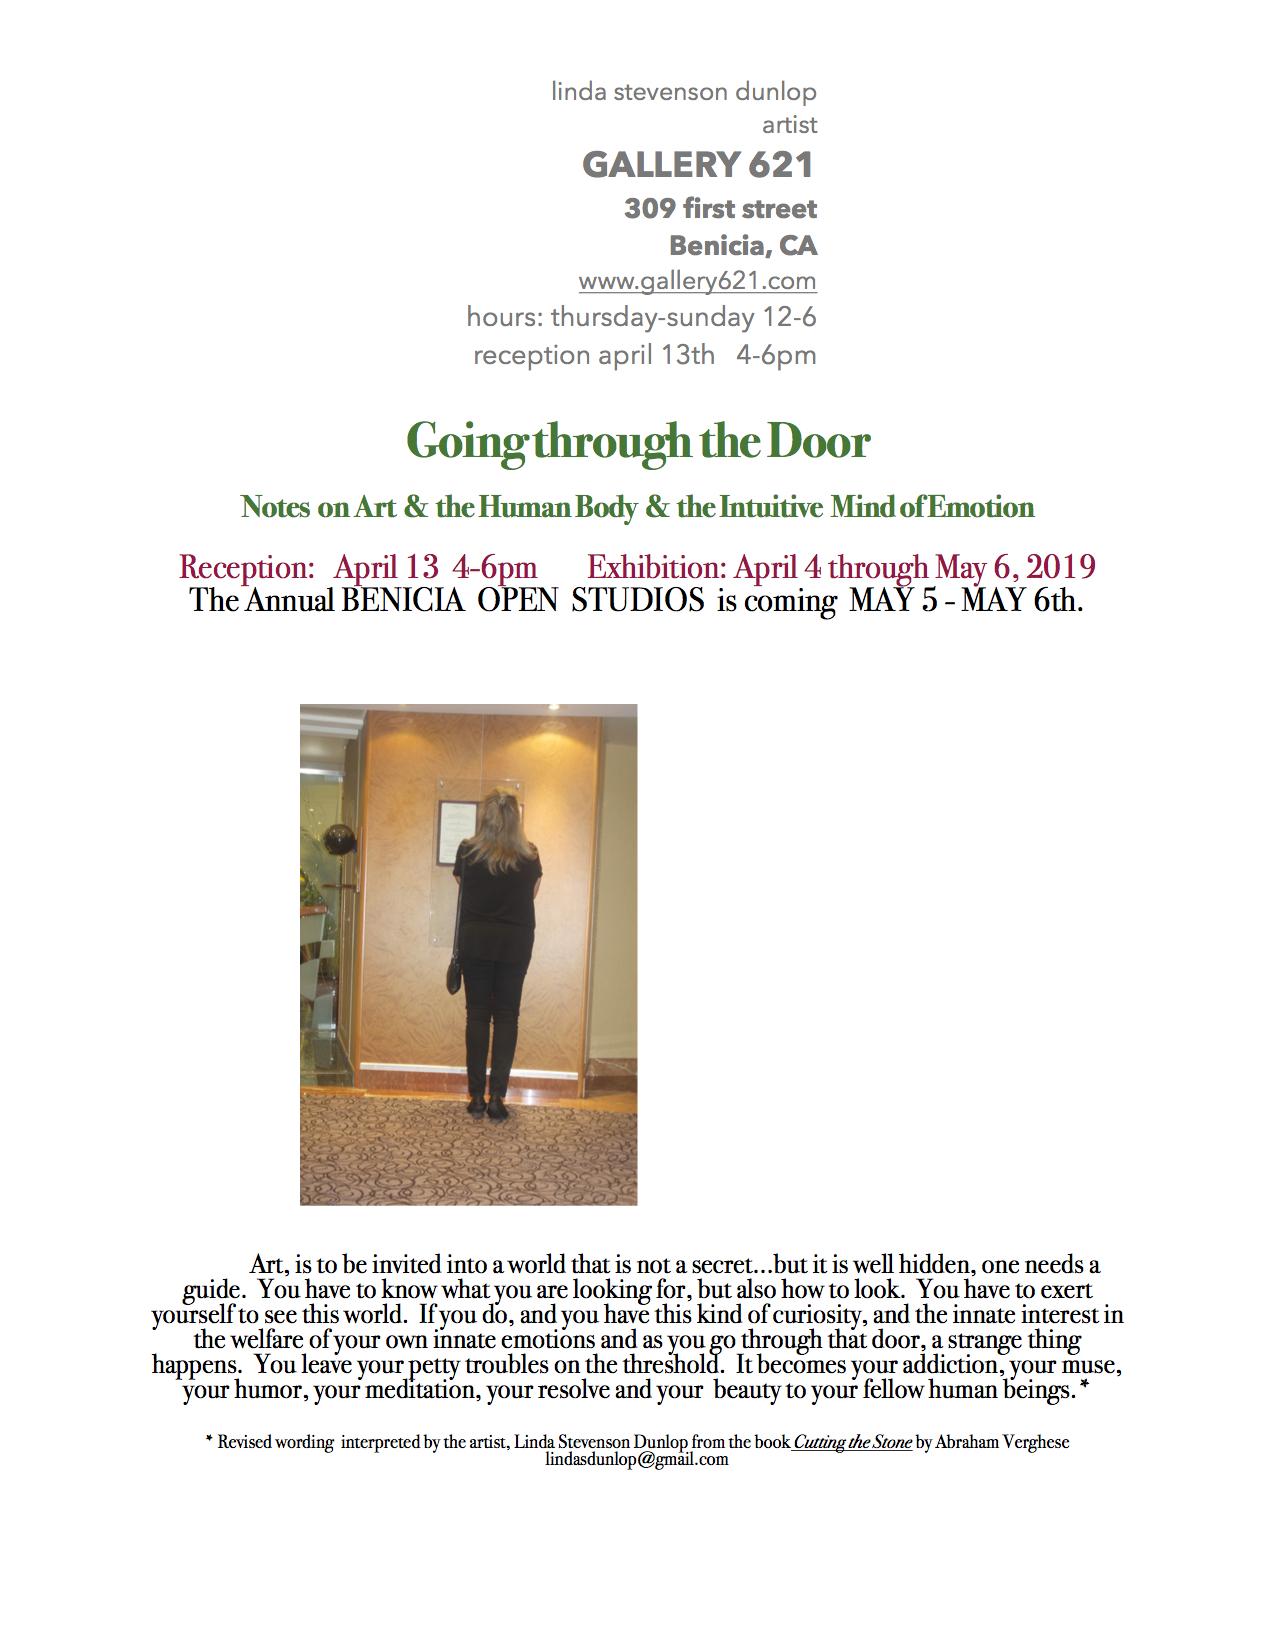 April2019_Gallery621_LSDunlop.jpg